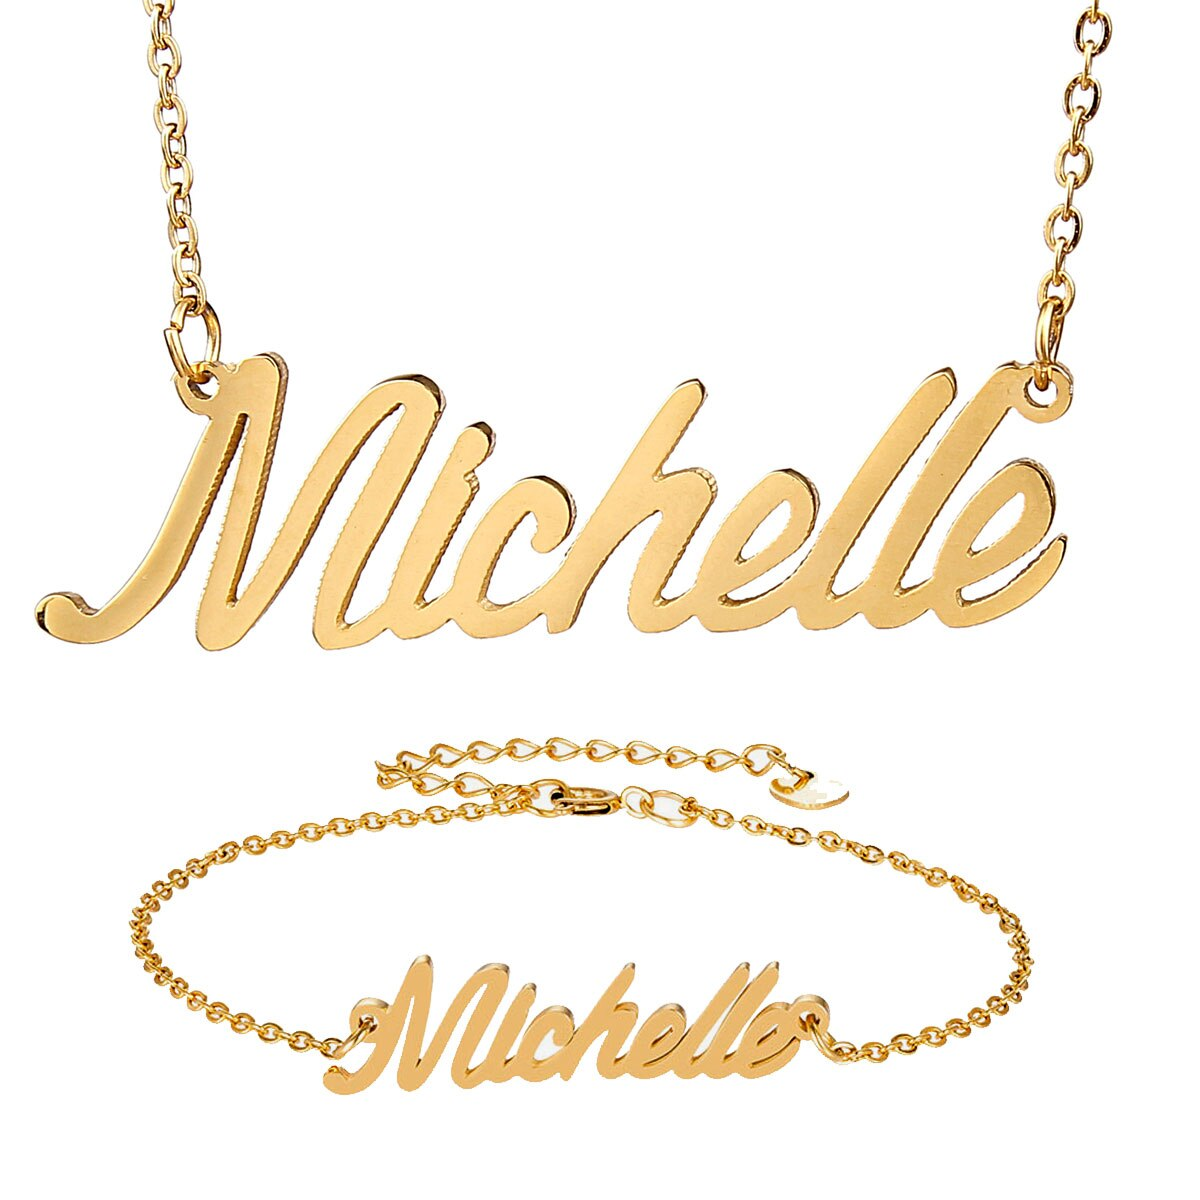 "Moda de acero inoxidable nombre collar pulsera Set ""michelín"" letra escritura oro gargantilla cadena COLLAR COLGANTE placa de identificación regalo"